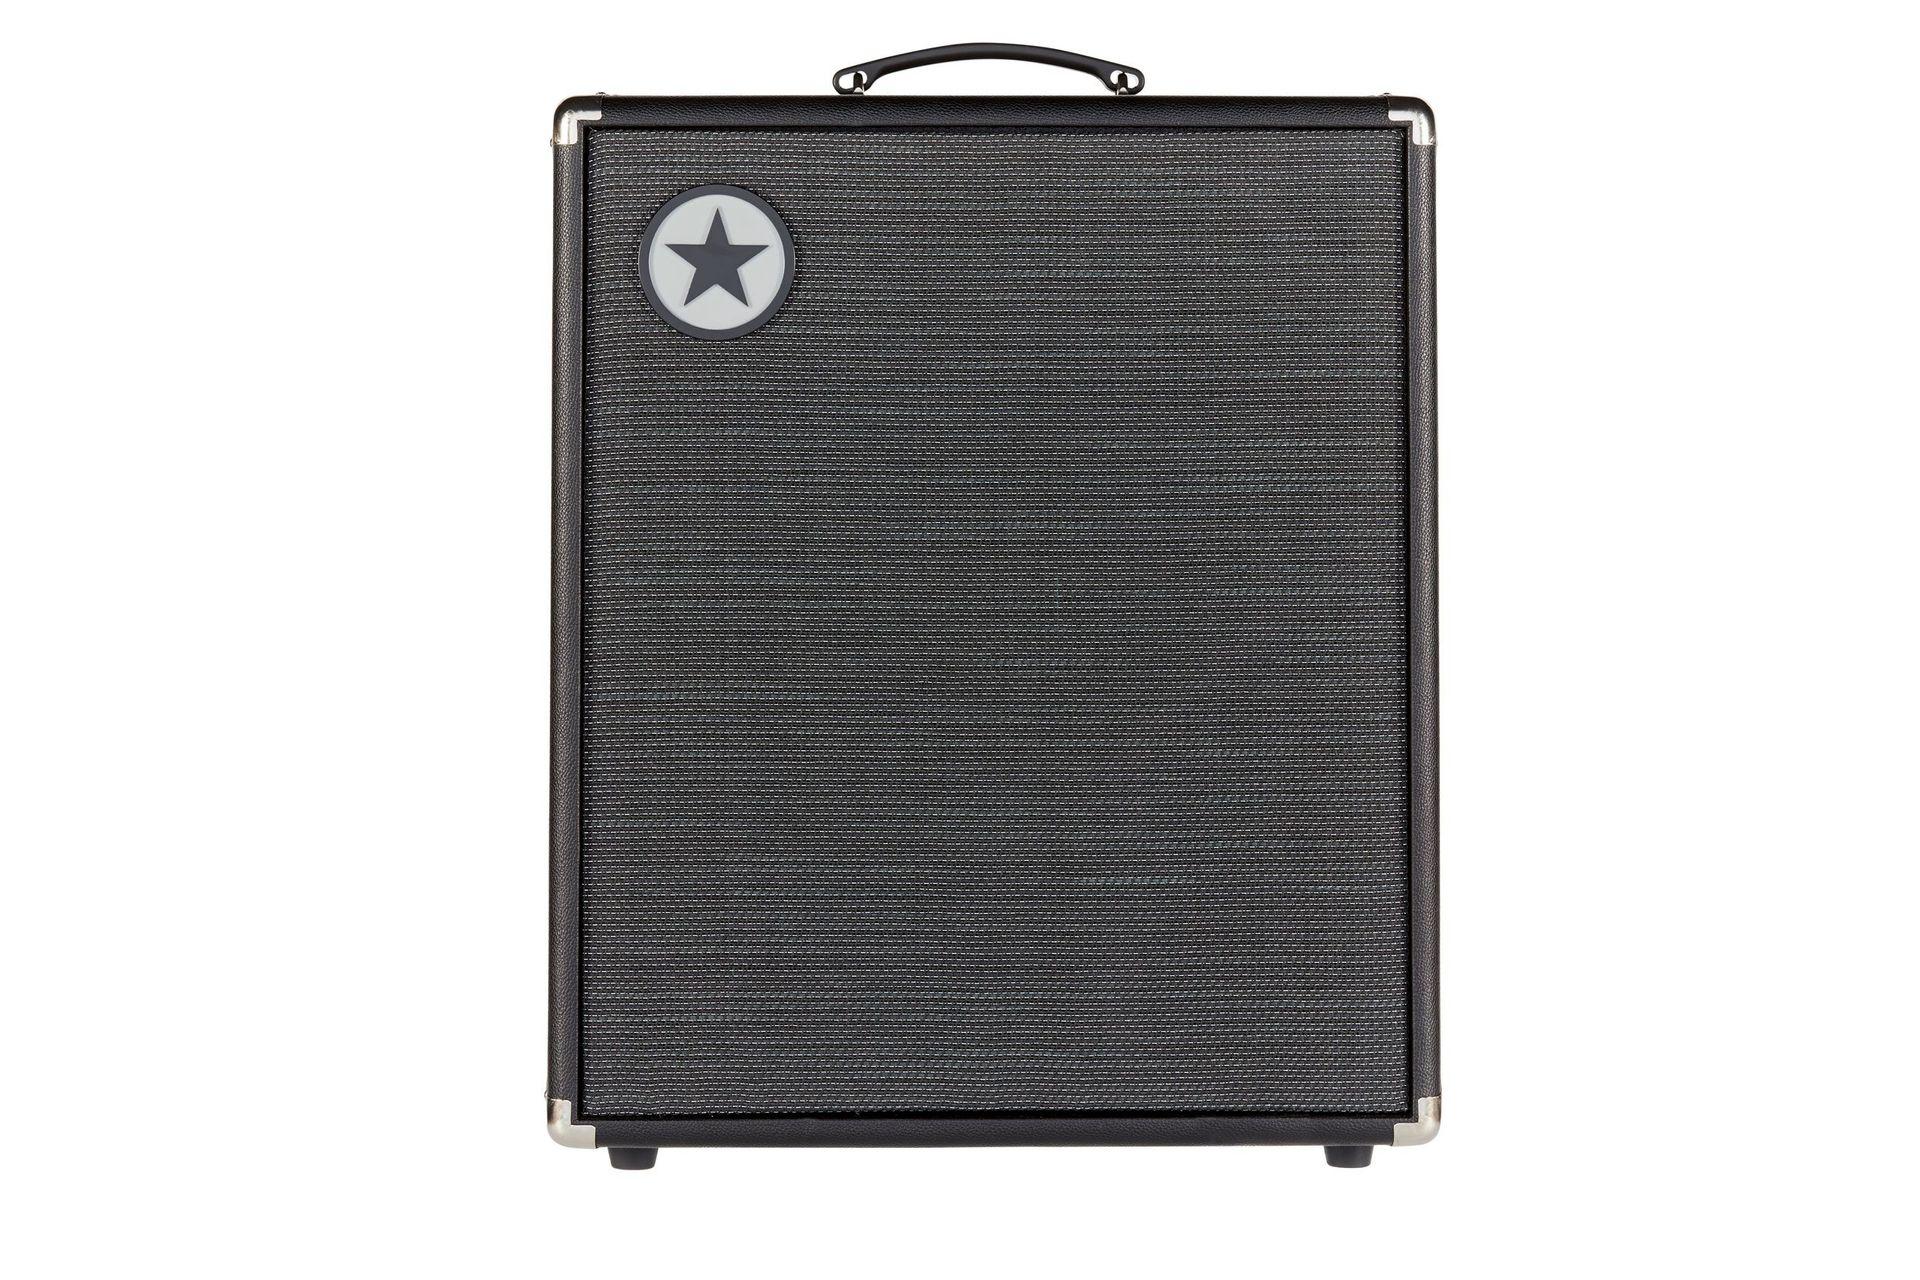 Blackstar U500 Unity Pro 500 Watt E-Bass Combo